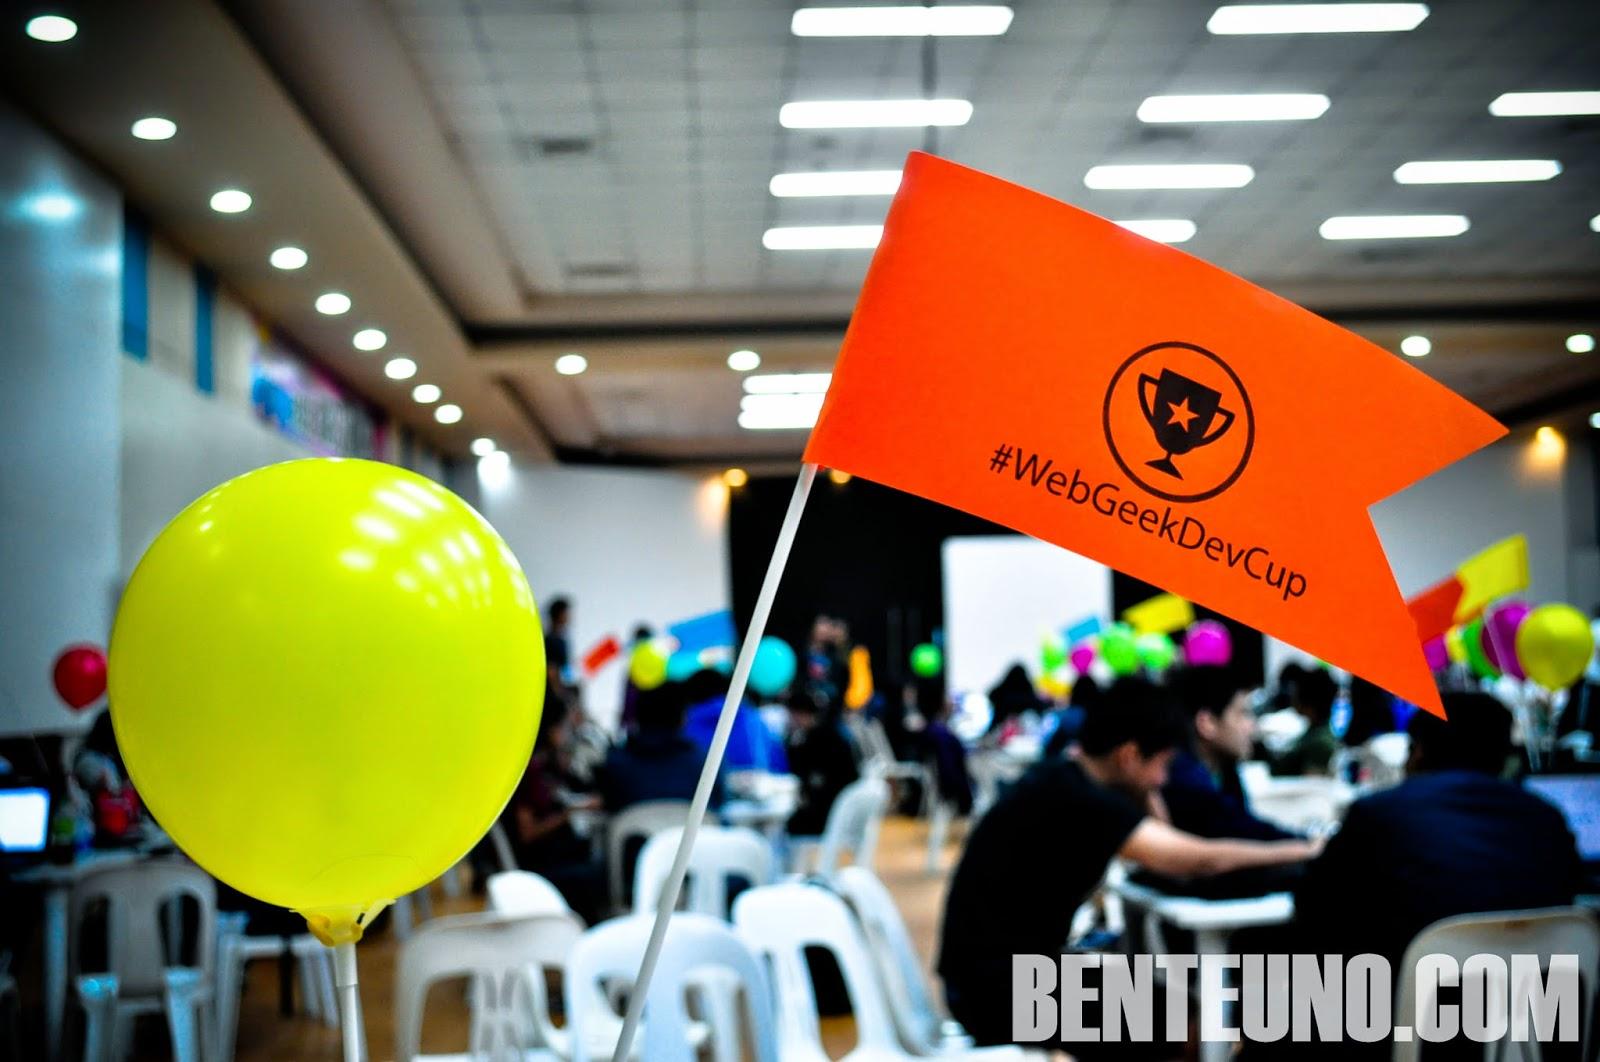 DevCup 2014 Banner